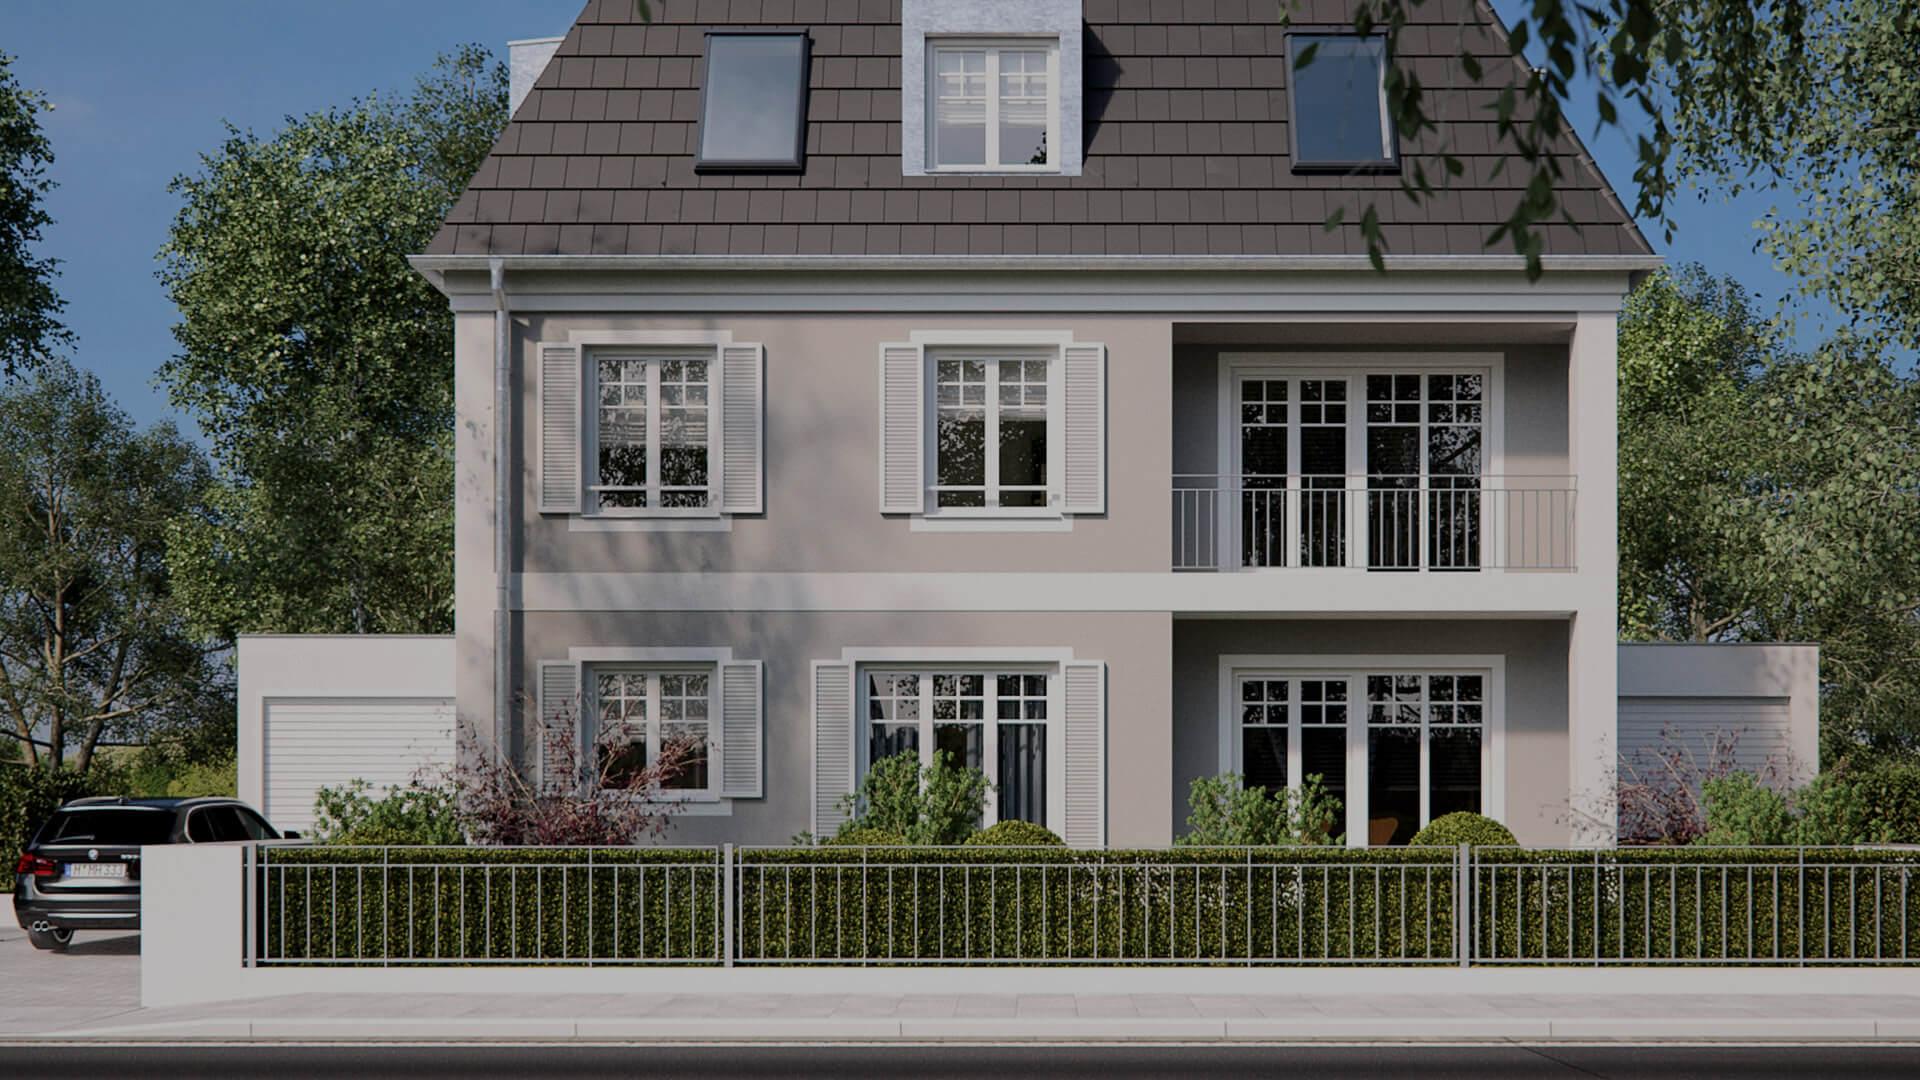 Die Hausmanufaktur pasing cervantesstraße link gmbh die münchner hausmanufaktur